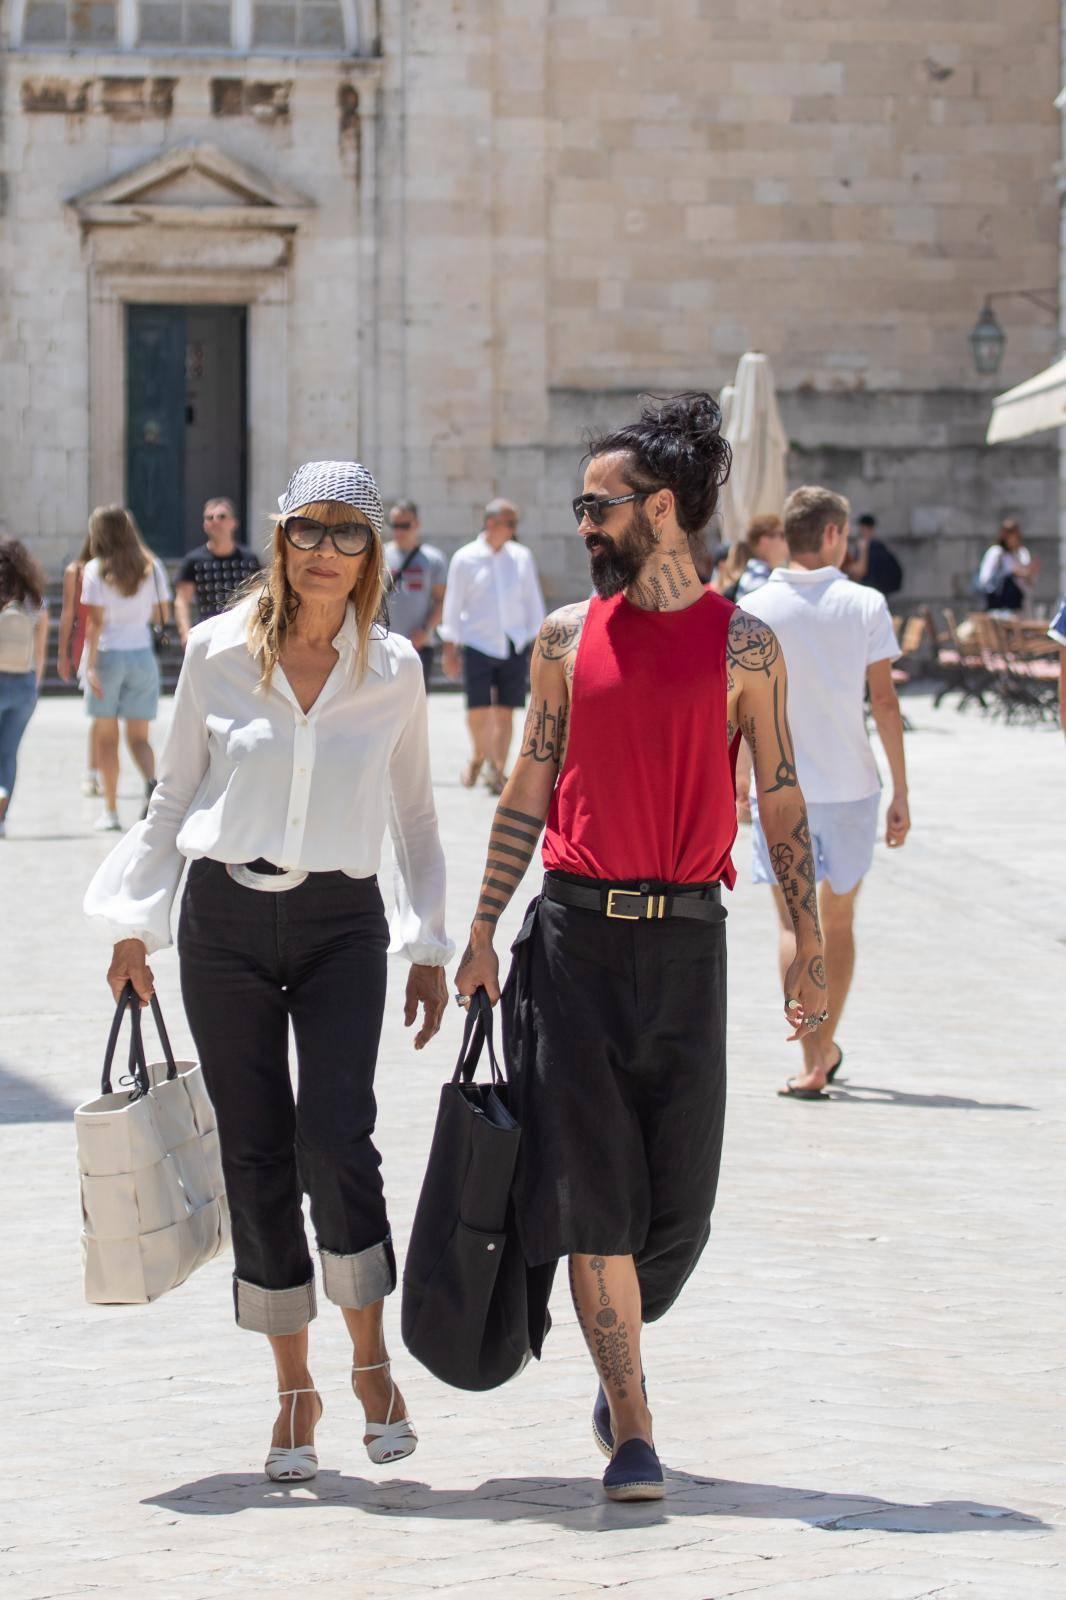 Dubrovnik: Đurđa Tedescki i Božo Vrećo u šetnji Stradunom